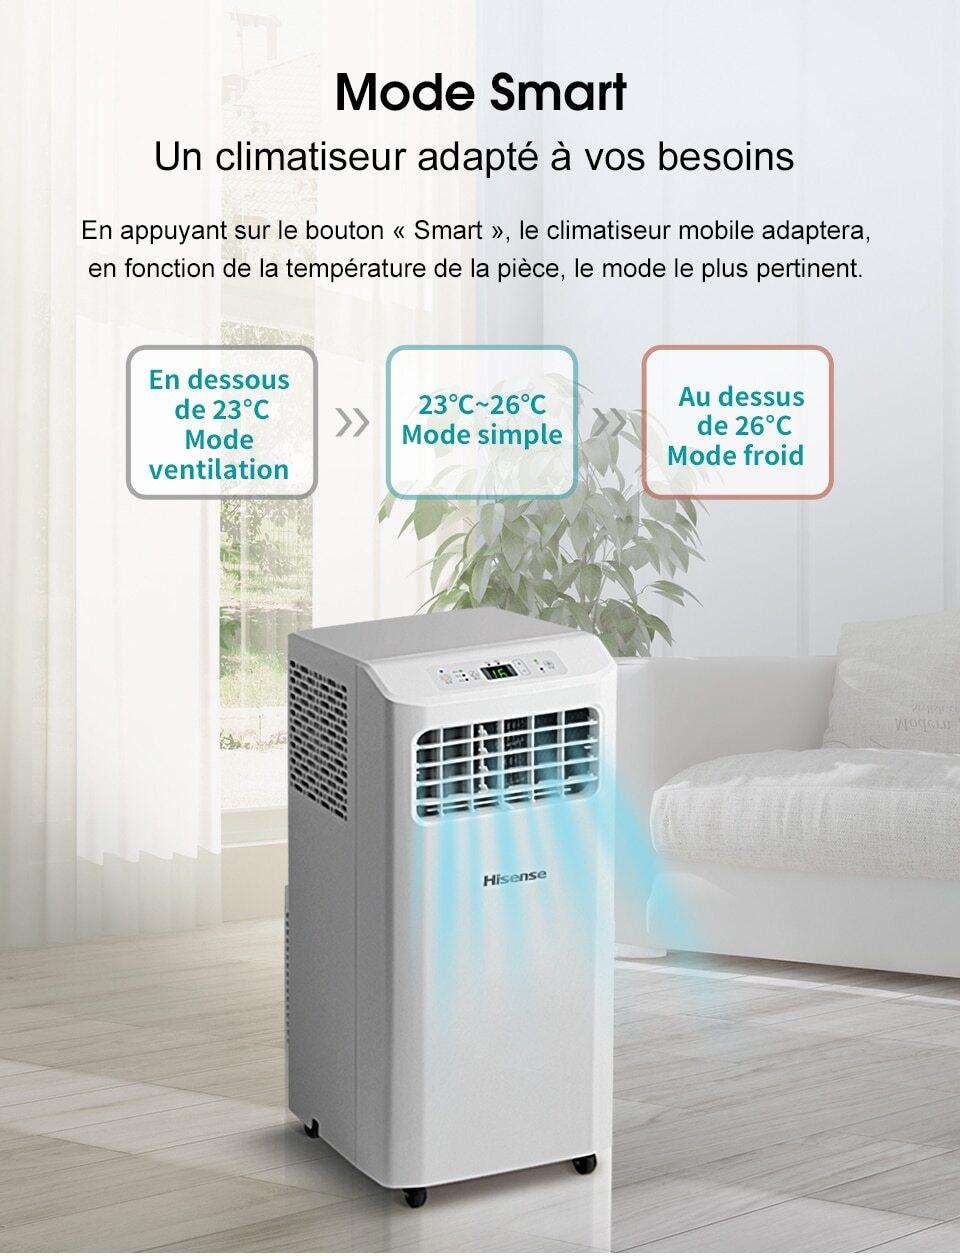 Hisense-climatiseur-mobile-HPAC07V-de-04.jpg